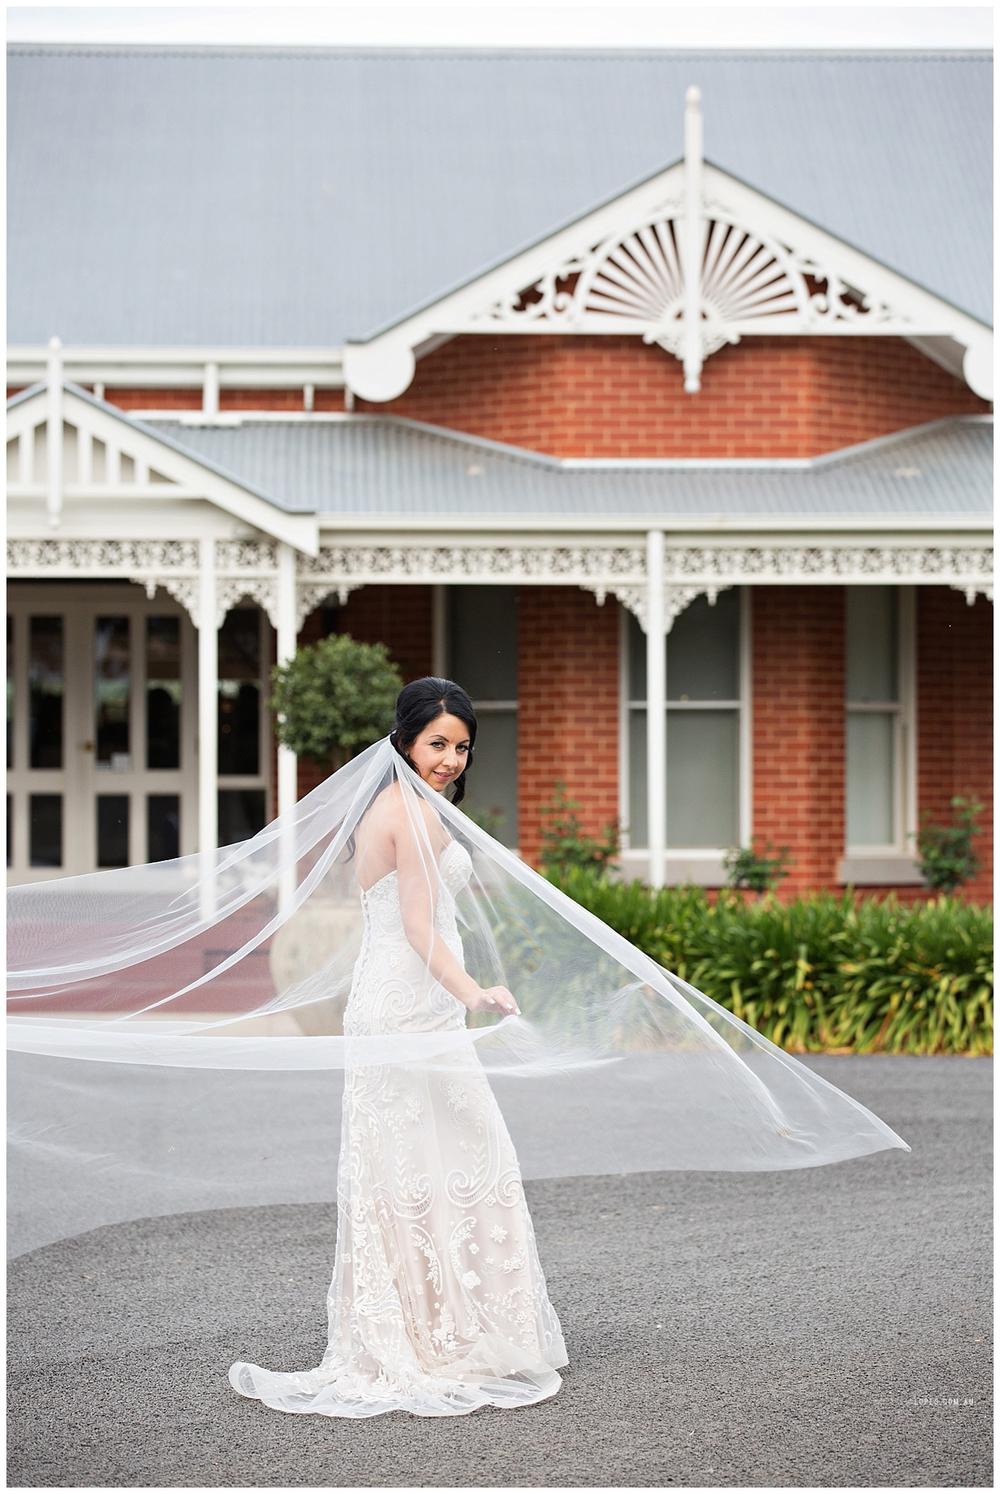 shepparton-wedding-photographer69.jpg